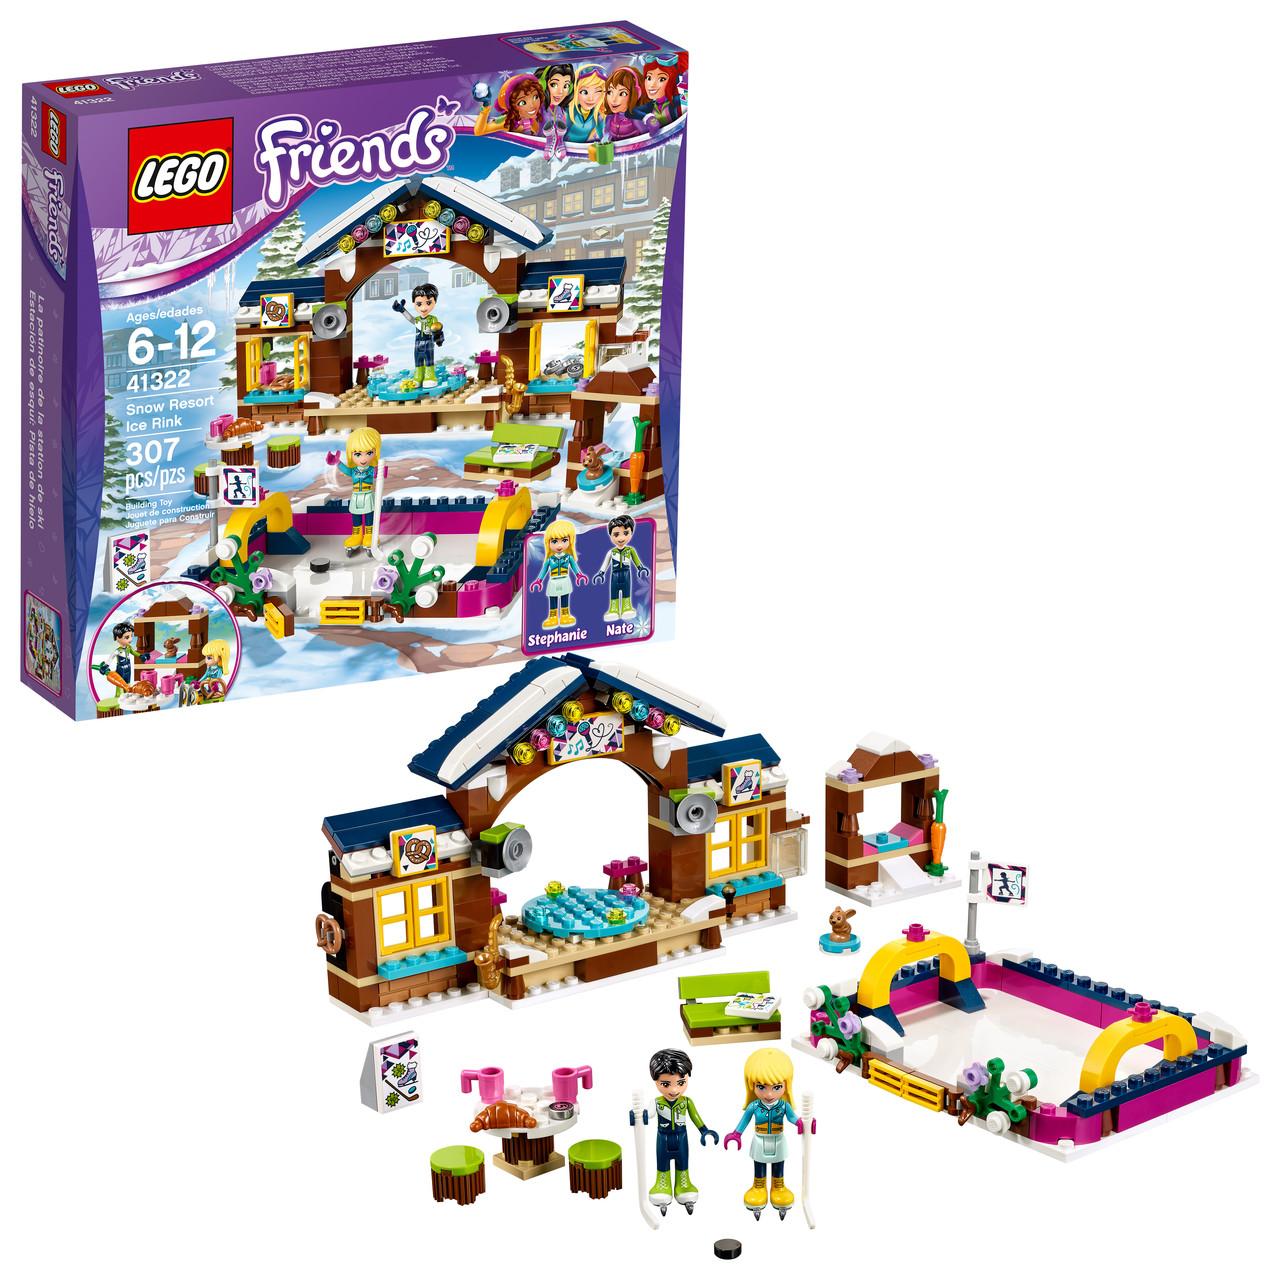 Lego 41322 Горнолыжный курорт: Каток  Snow Resort Ice Rink Лего френдс Хартлейк-Сіті